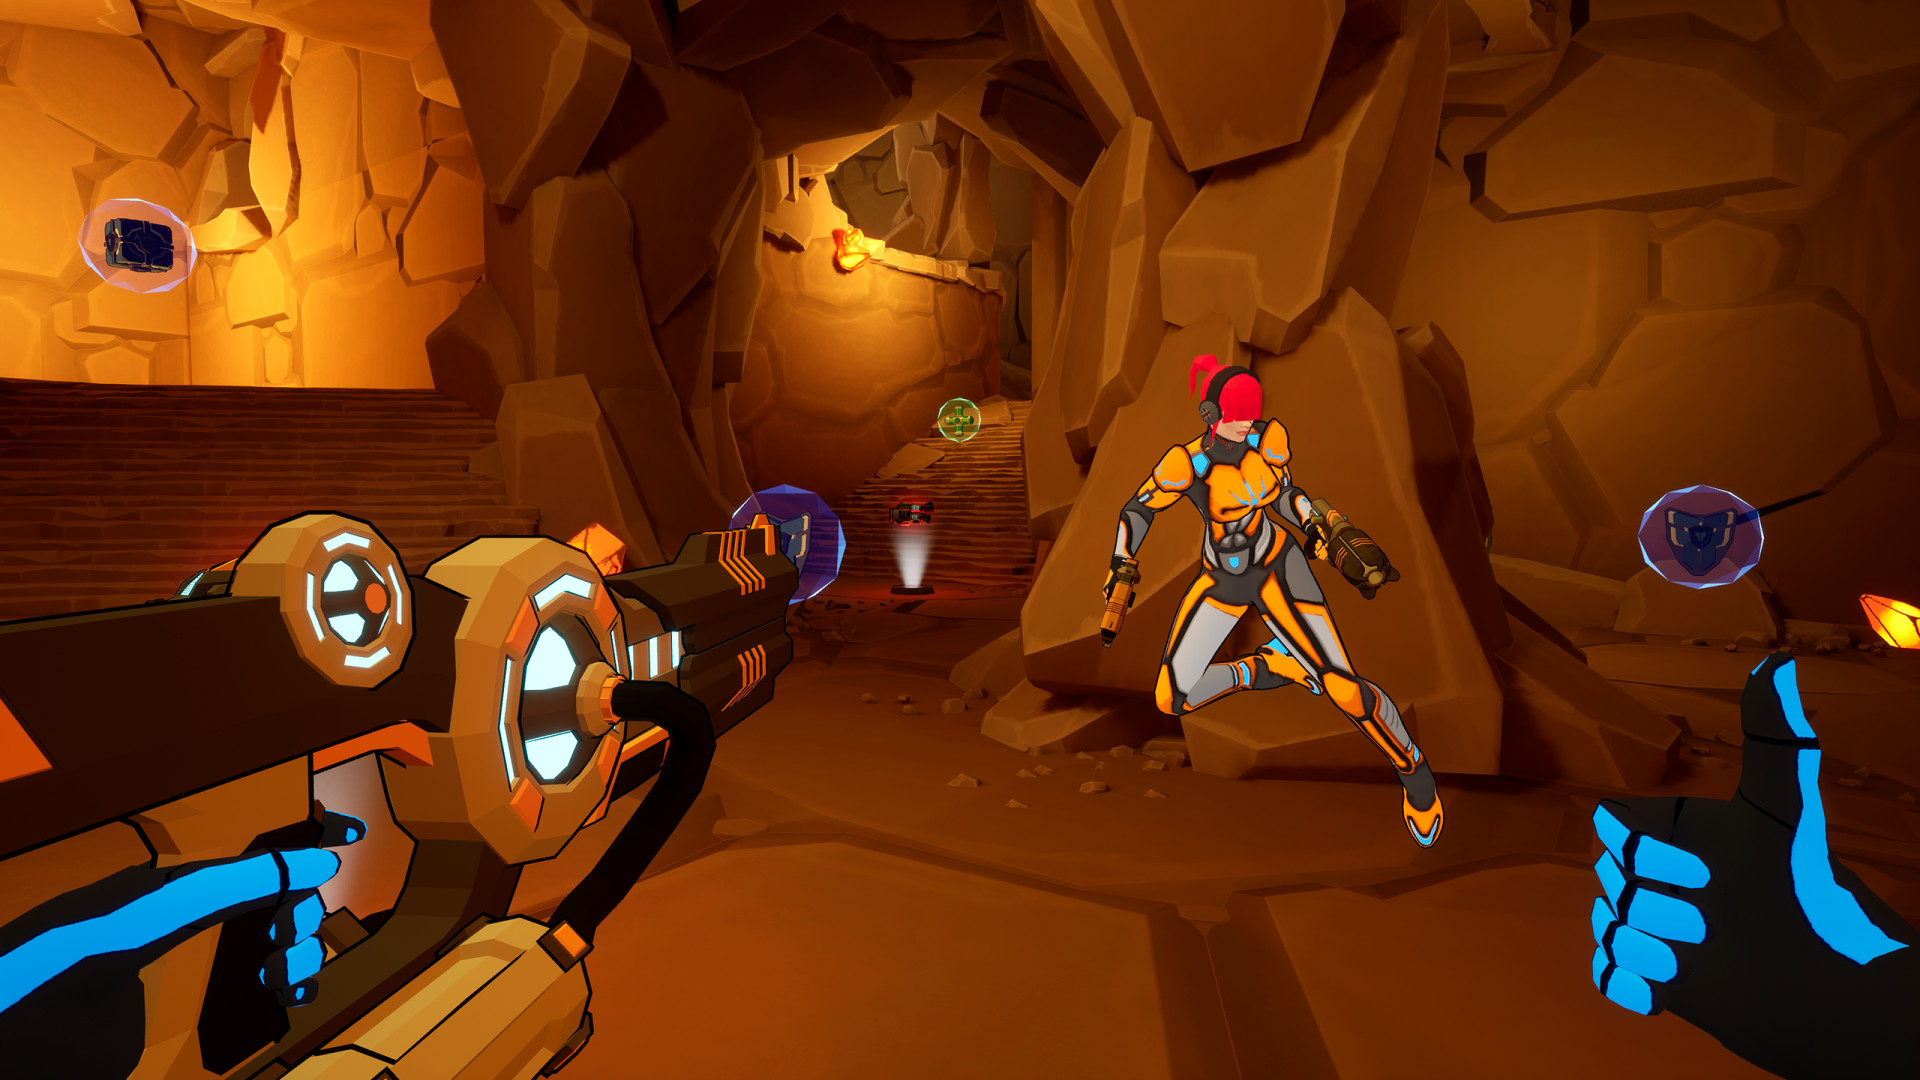 Oculus Quest 游戏《Grapple Tournament》格斗锦标赛VR插图(1)